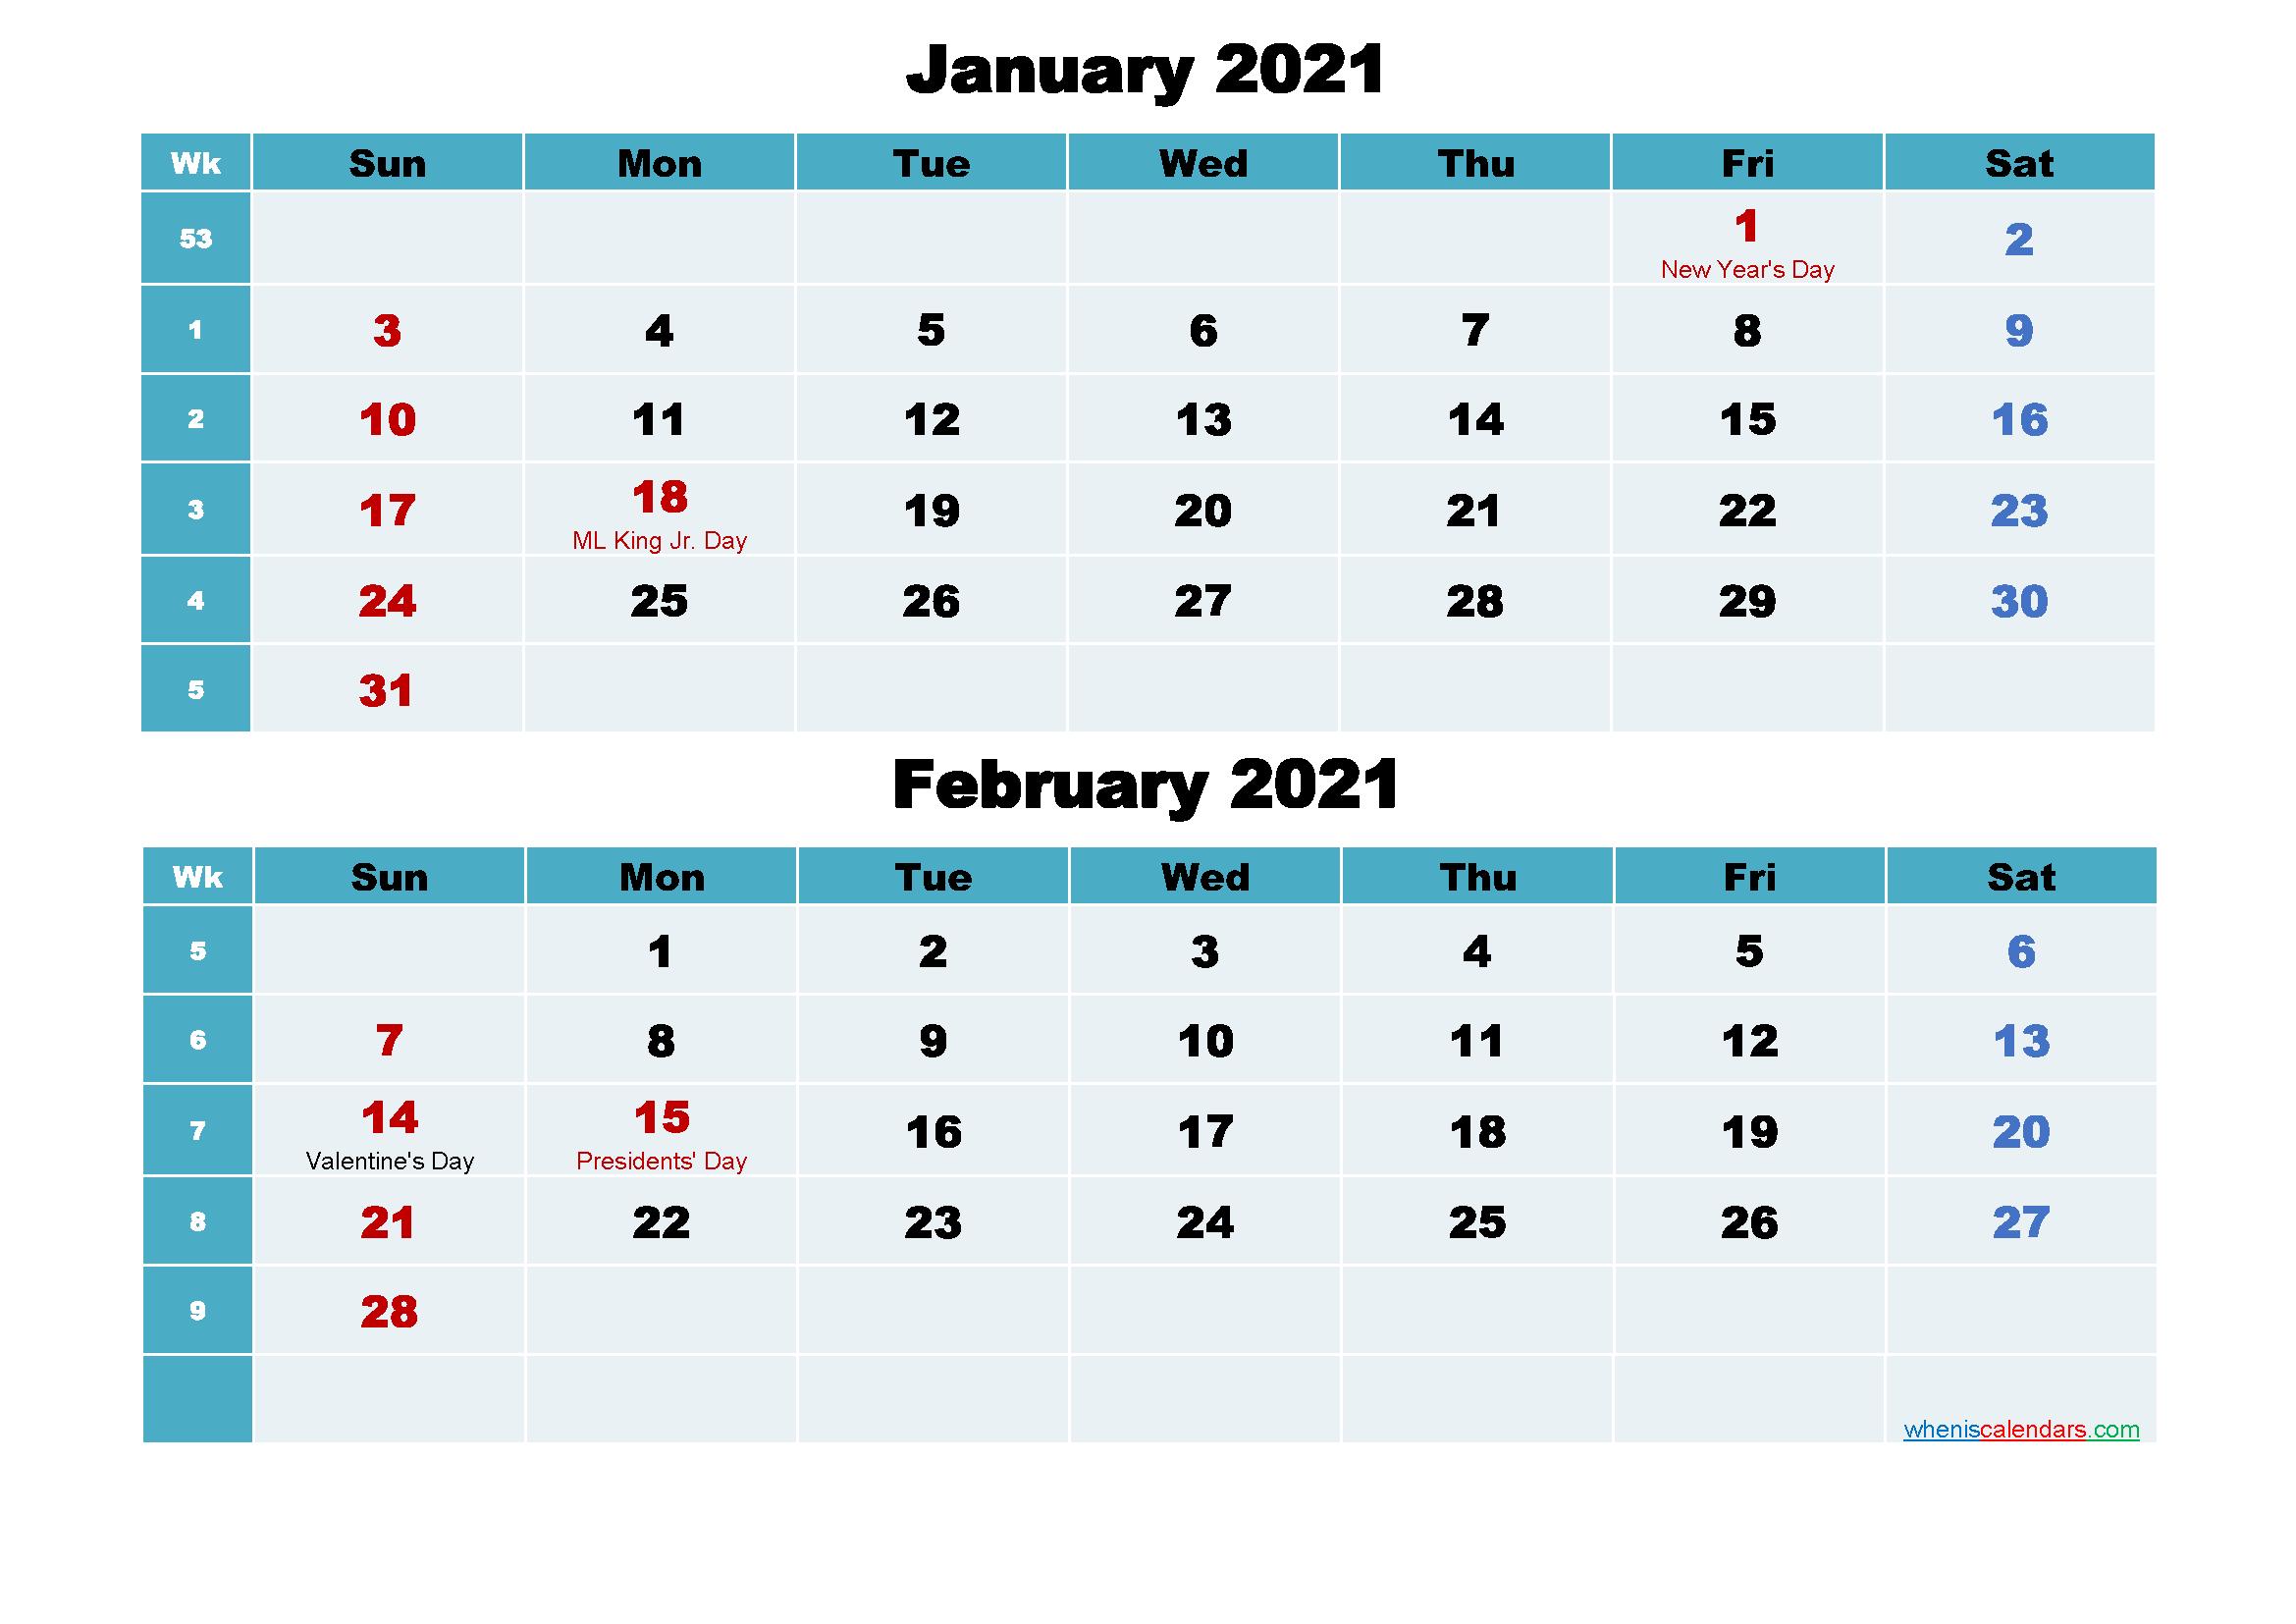 January and February 2021 Calendar with Holidays